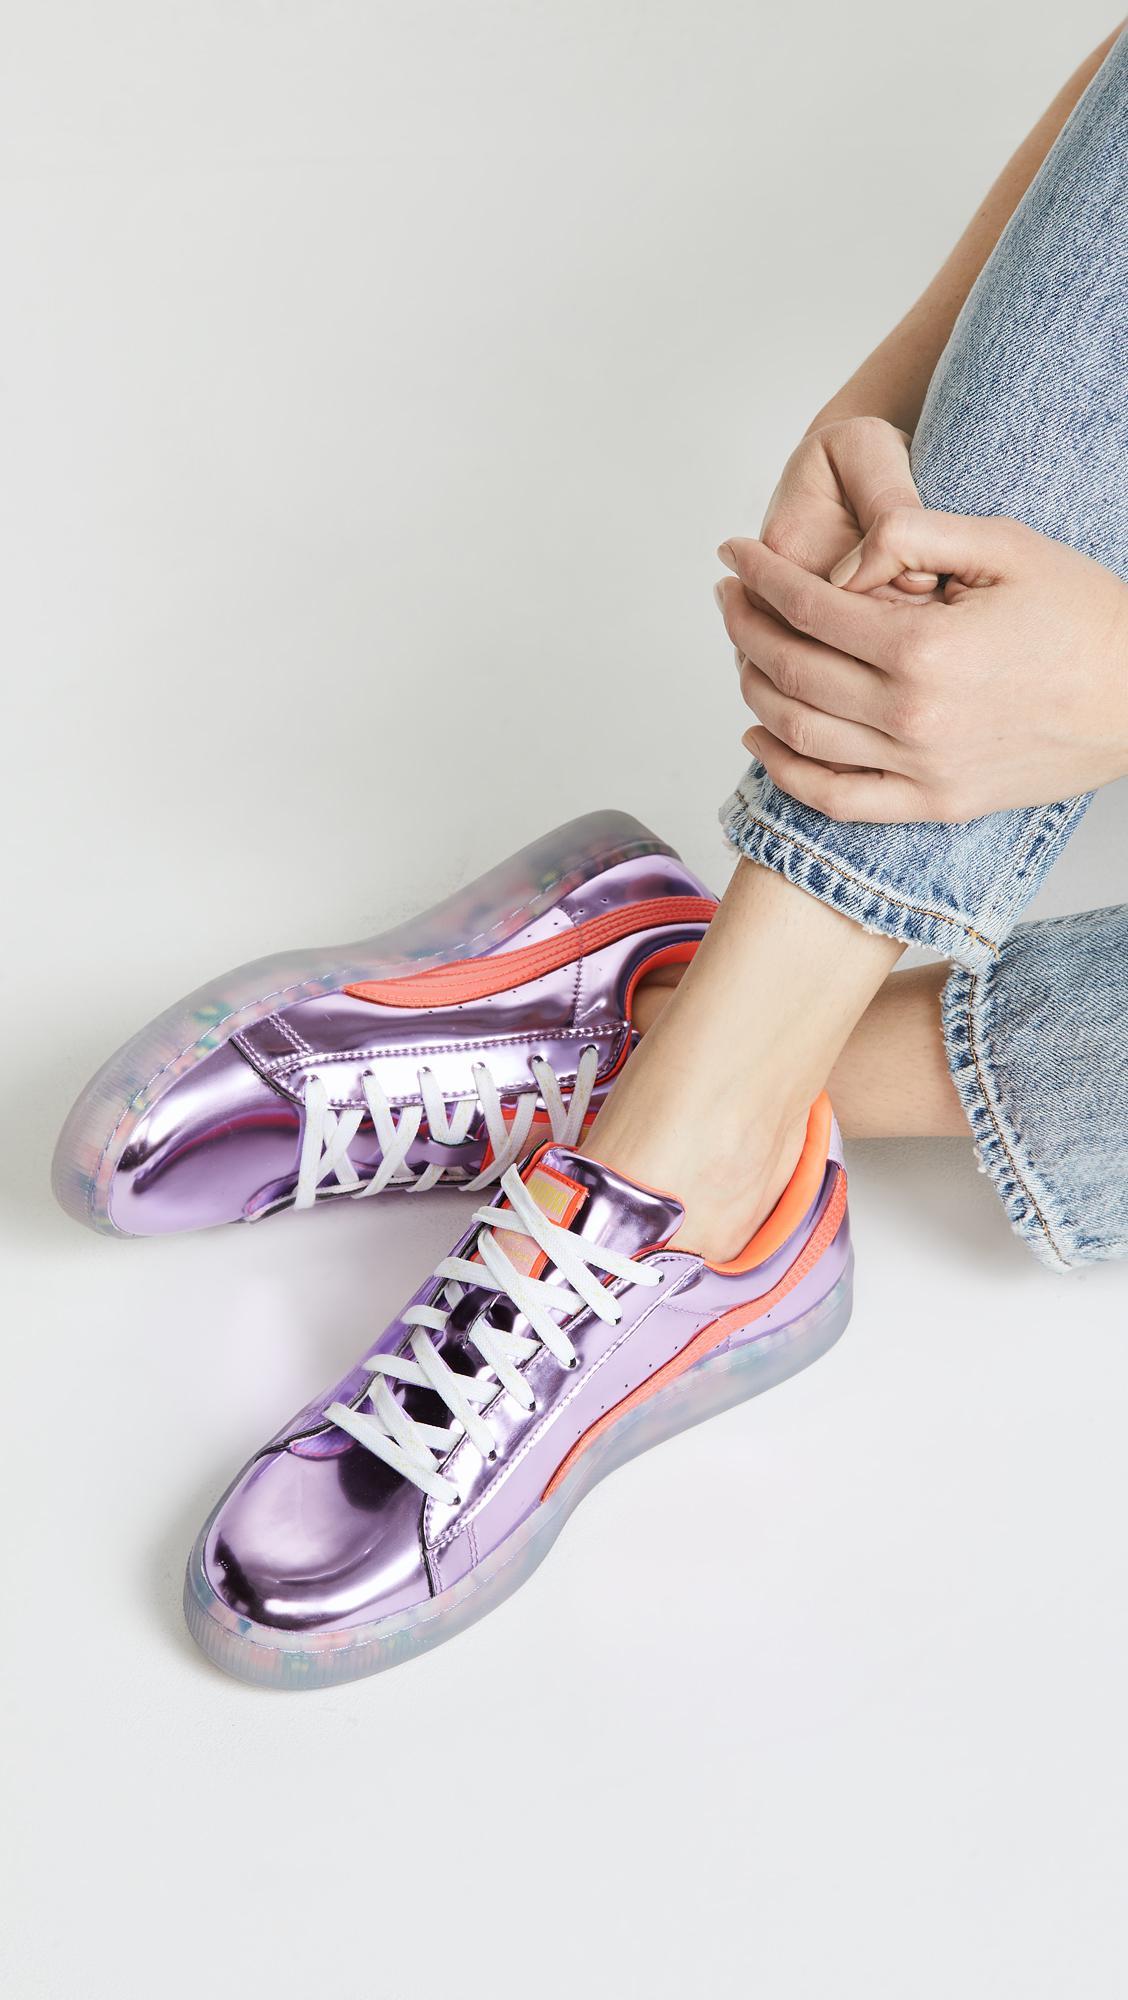 ec1565dc340 Lyst - PUMA X Sophia Webster Basket Candy Princess Sneakers in Pink